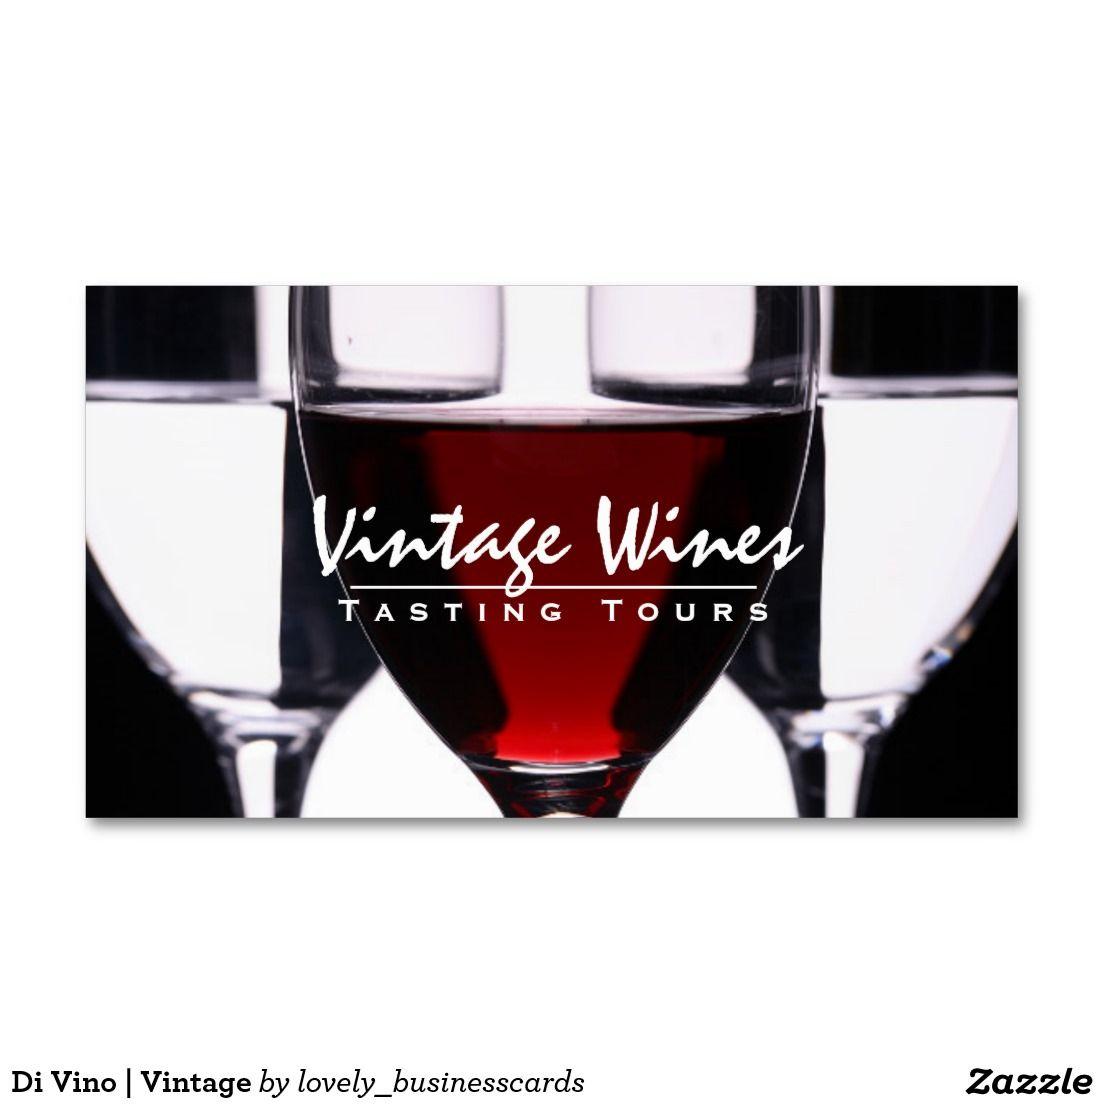 Di Vino Vintage Standard Business Card Printing Business Cards Wine Wine Expert